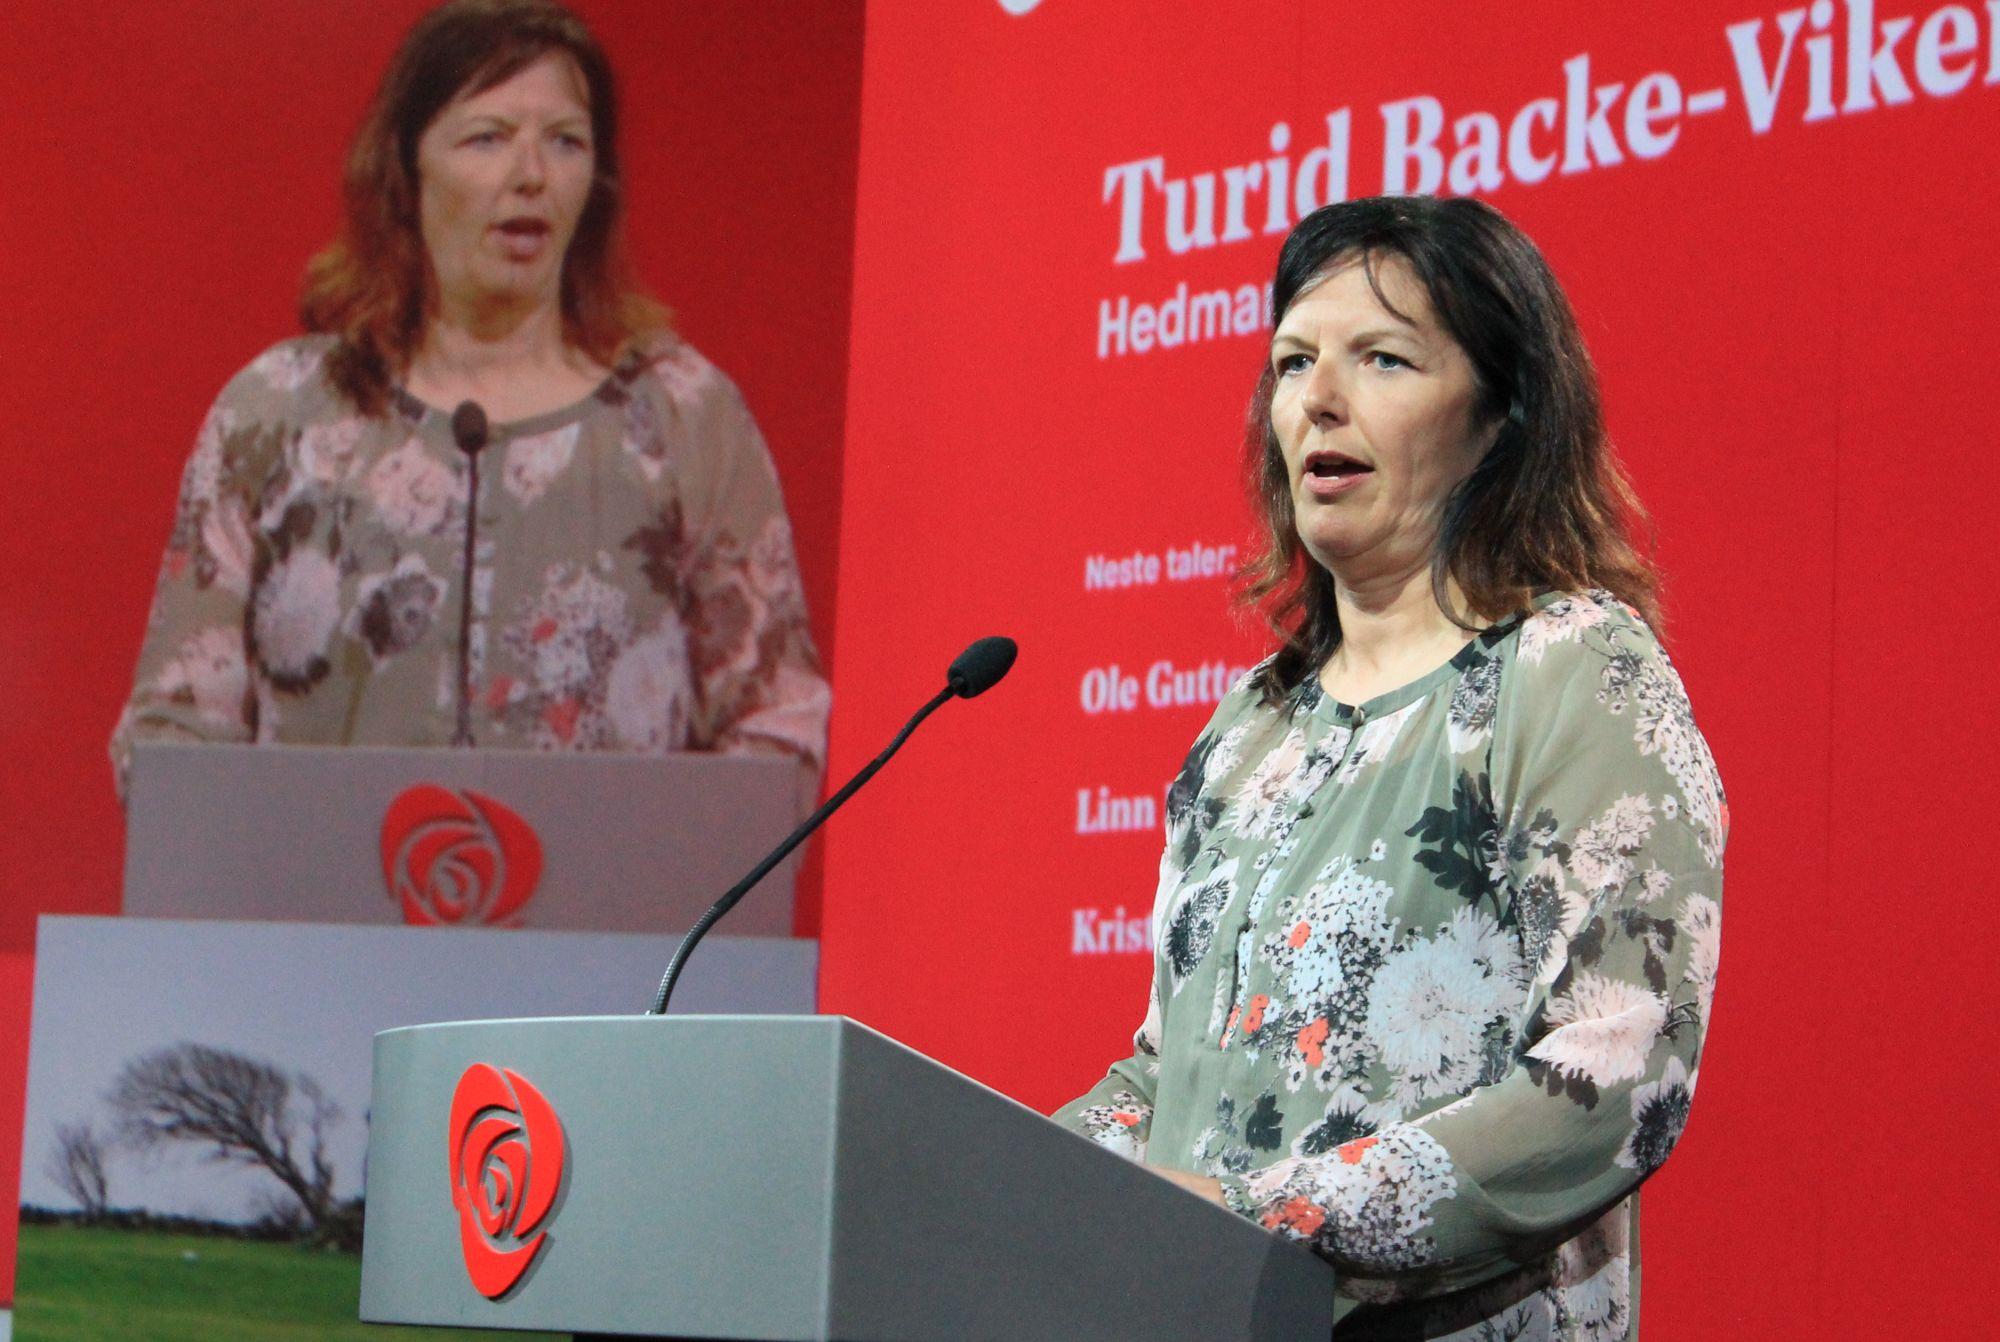 Turid Backe-Viken. Foto: Bjørn Jarle Røberg-Larsen